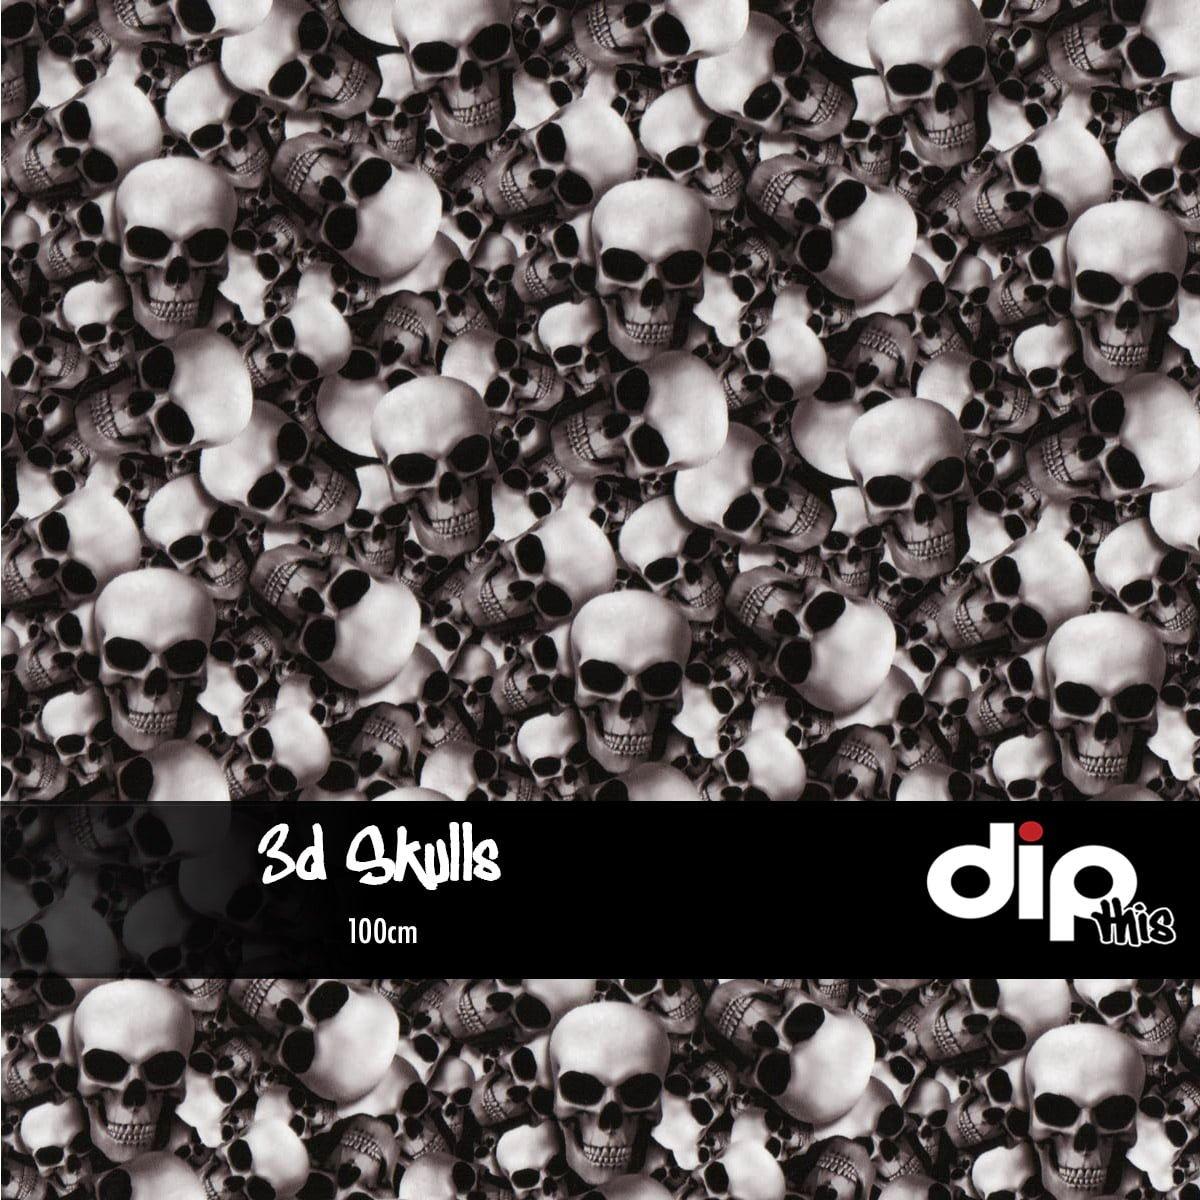 3D Skulls Dip Kit